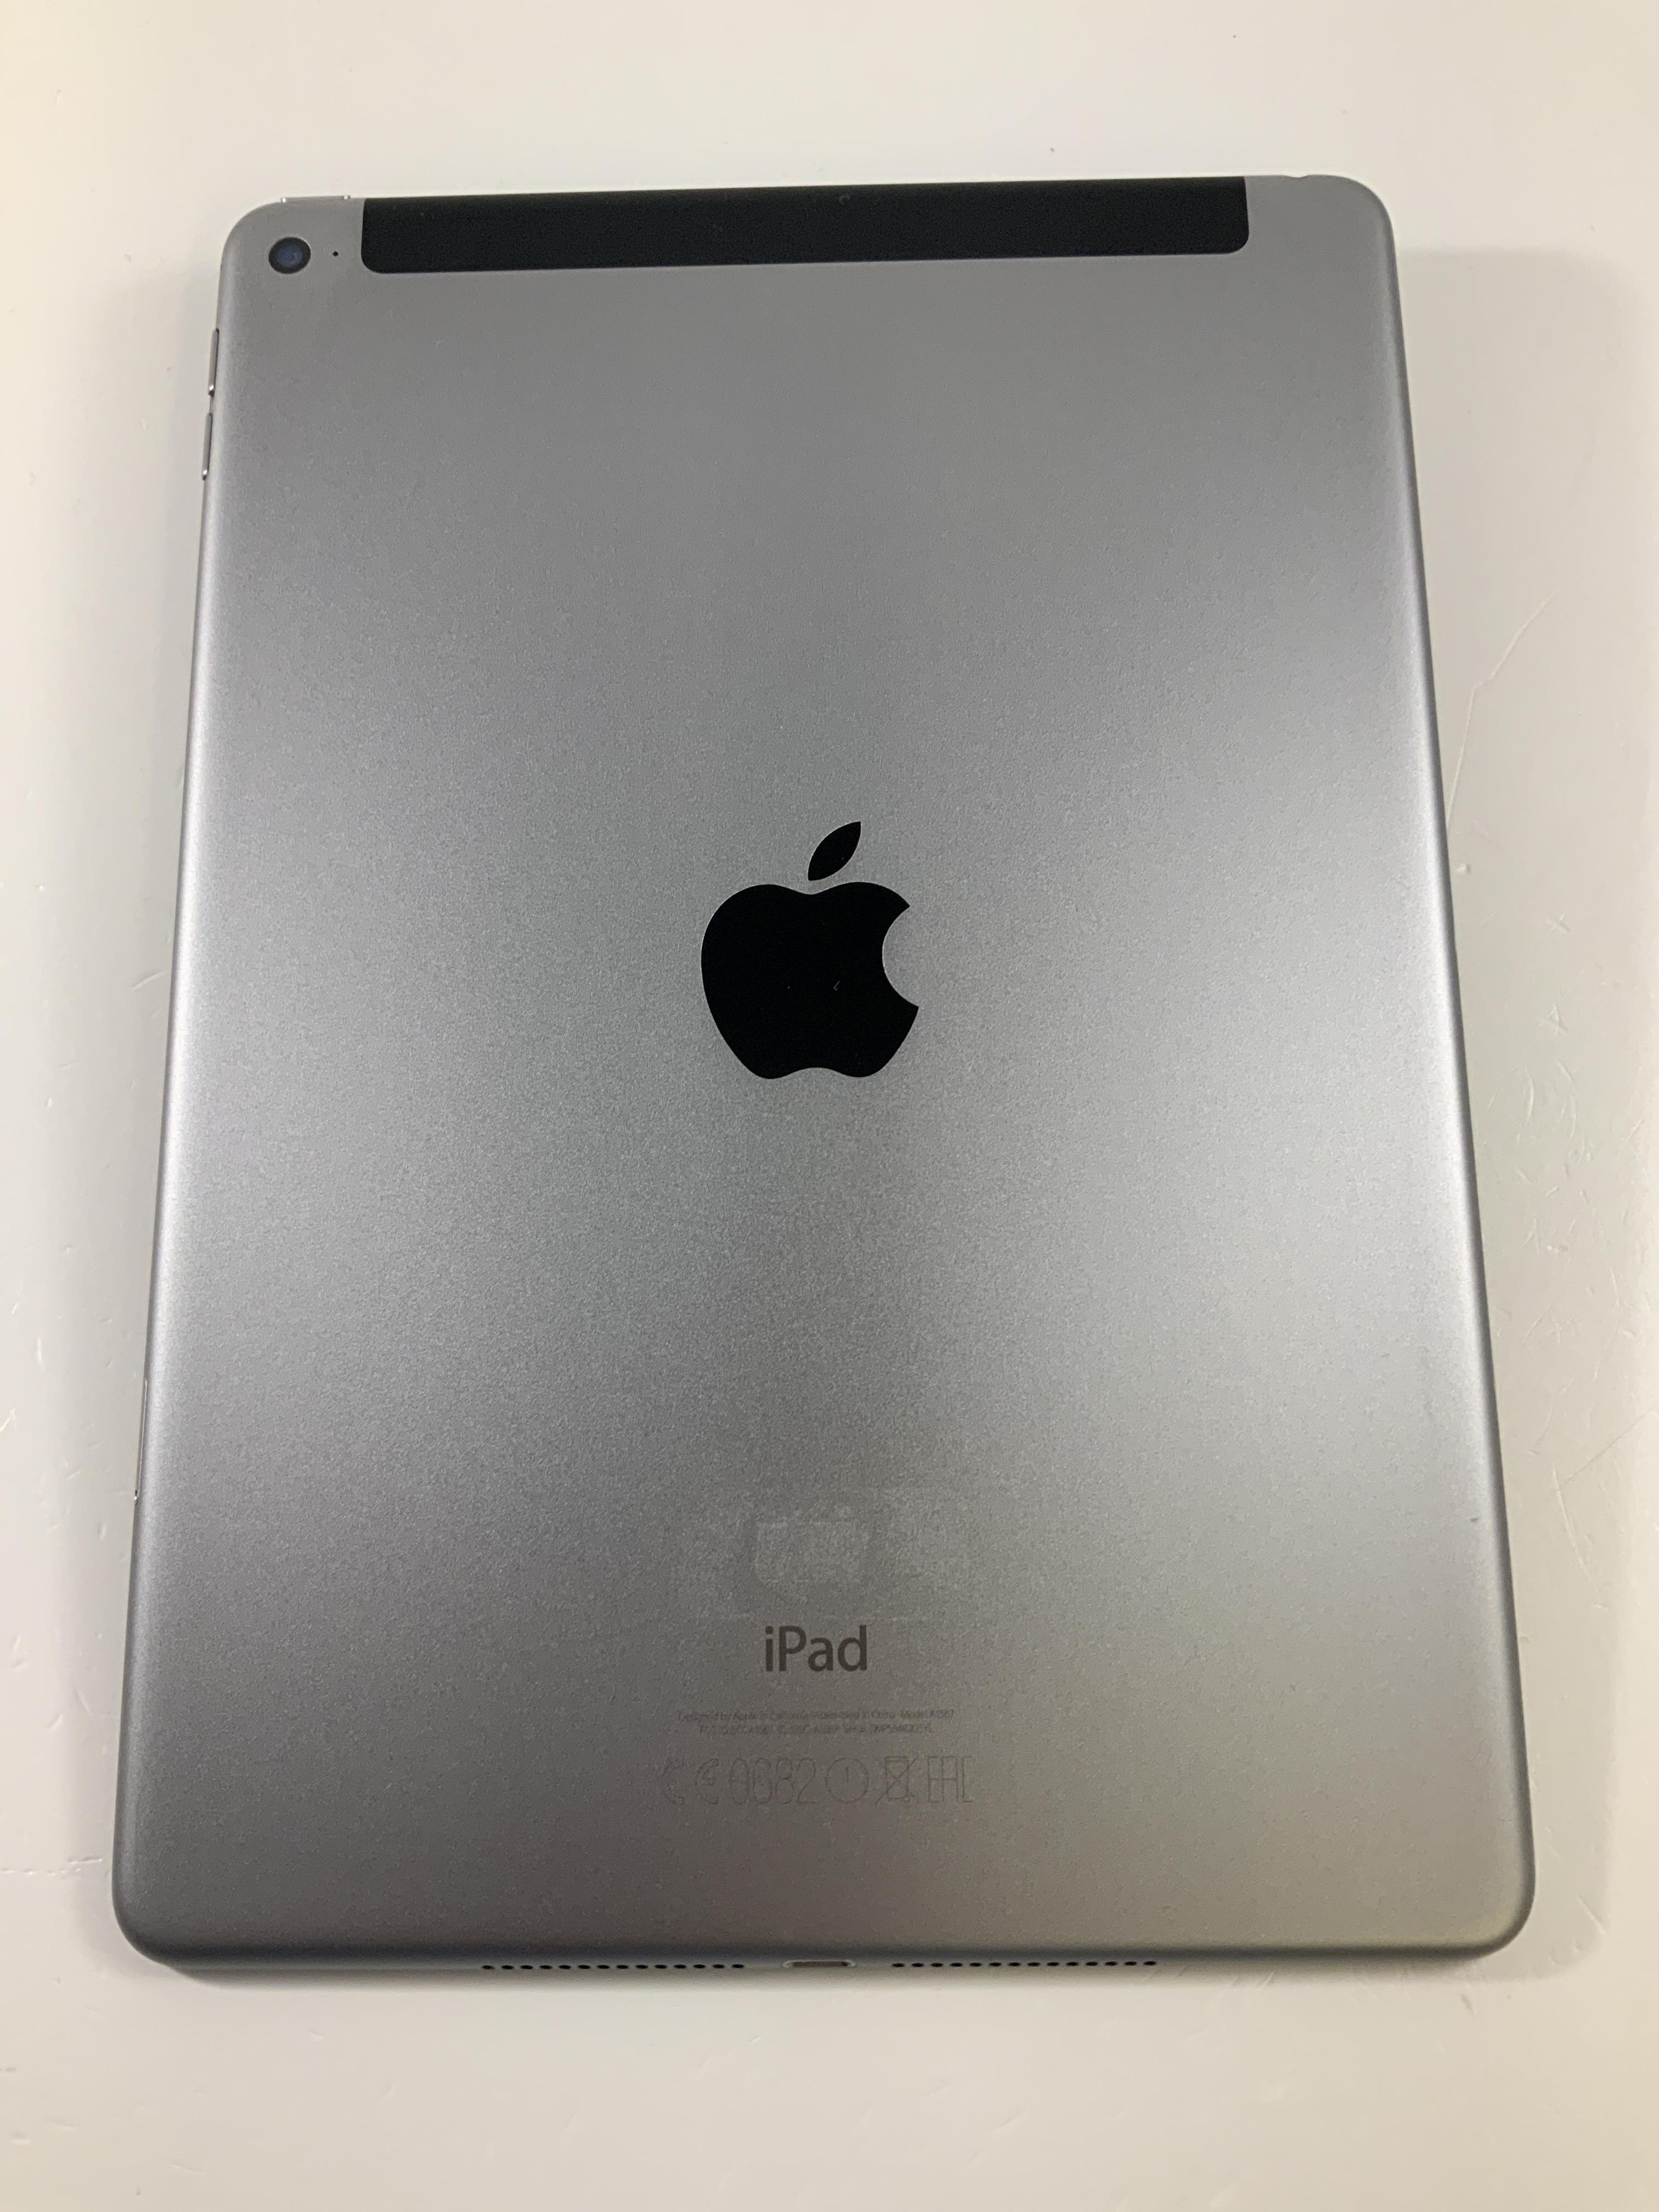 iPad Air 2 Wi-Fi + Cellular 64GB, 64GB, Space Gray, obraz 2